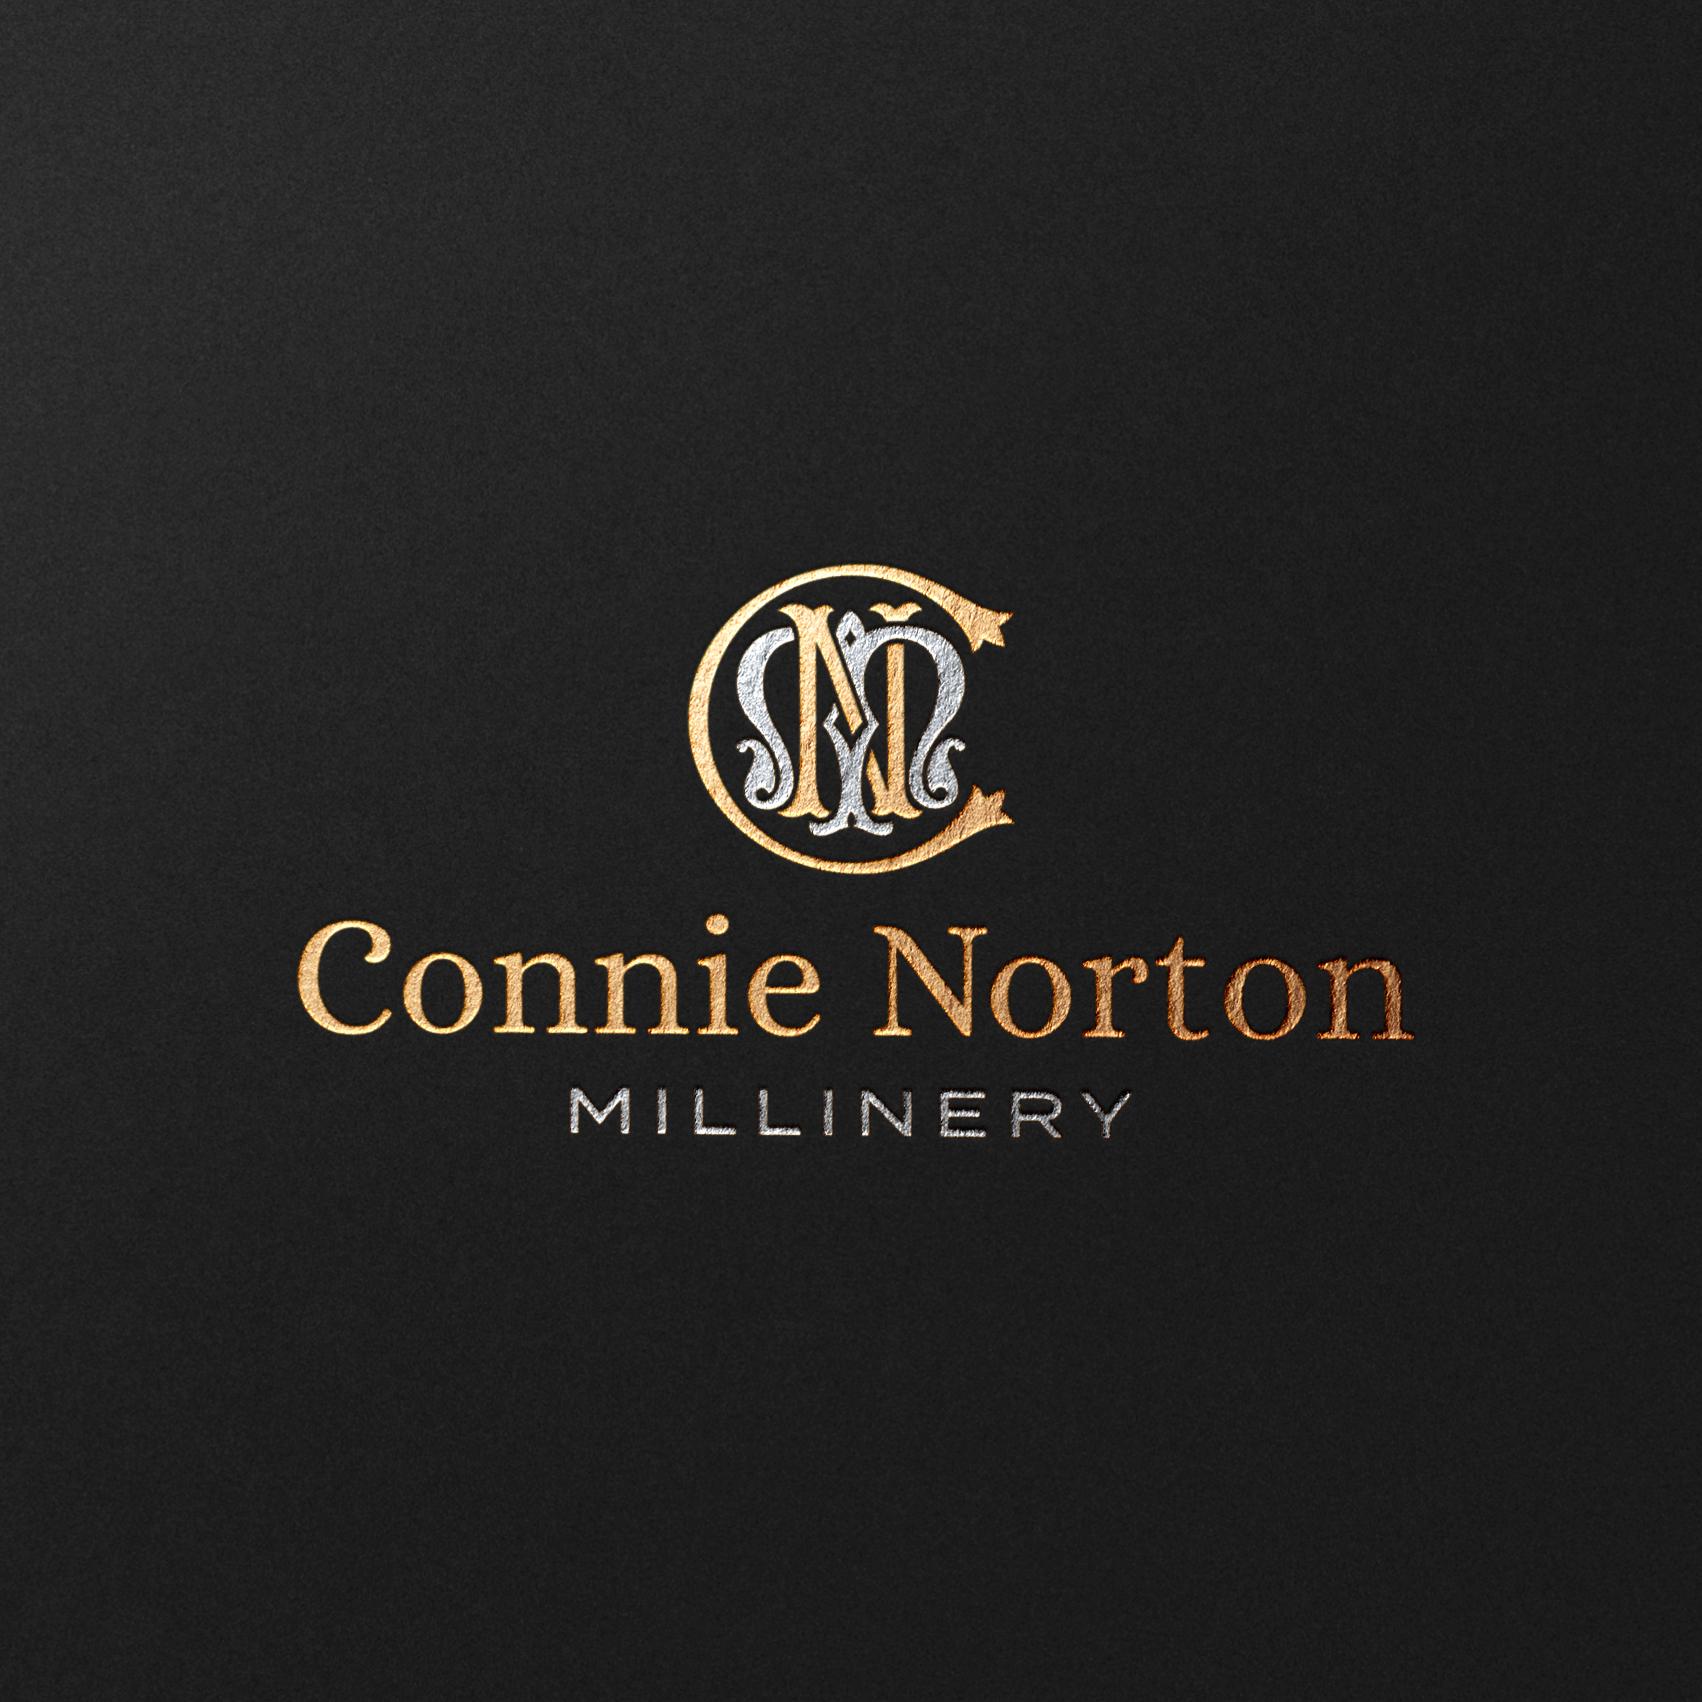 C N Millinery Luxury Wedding Hat Branding and Logo Design by MK Creative